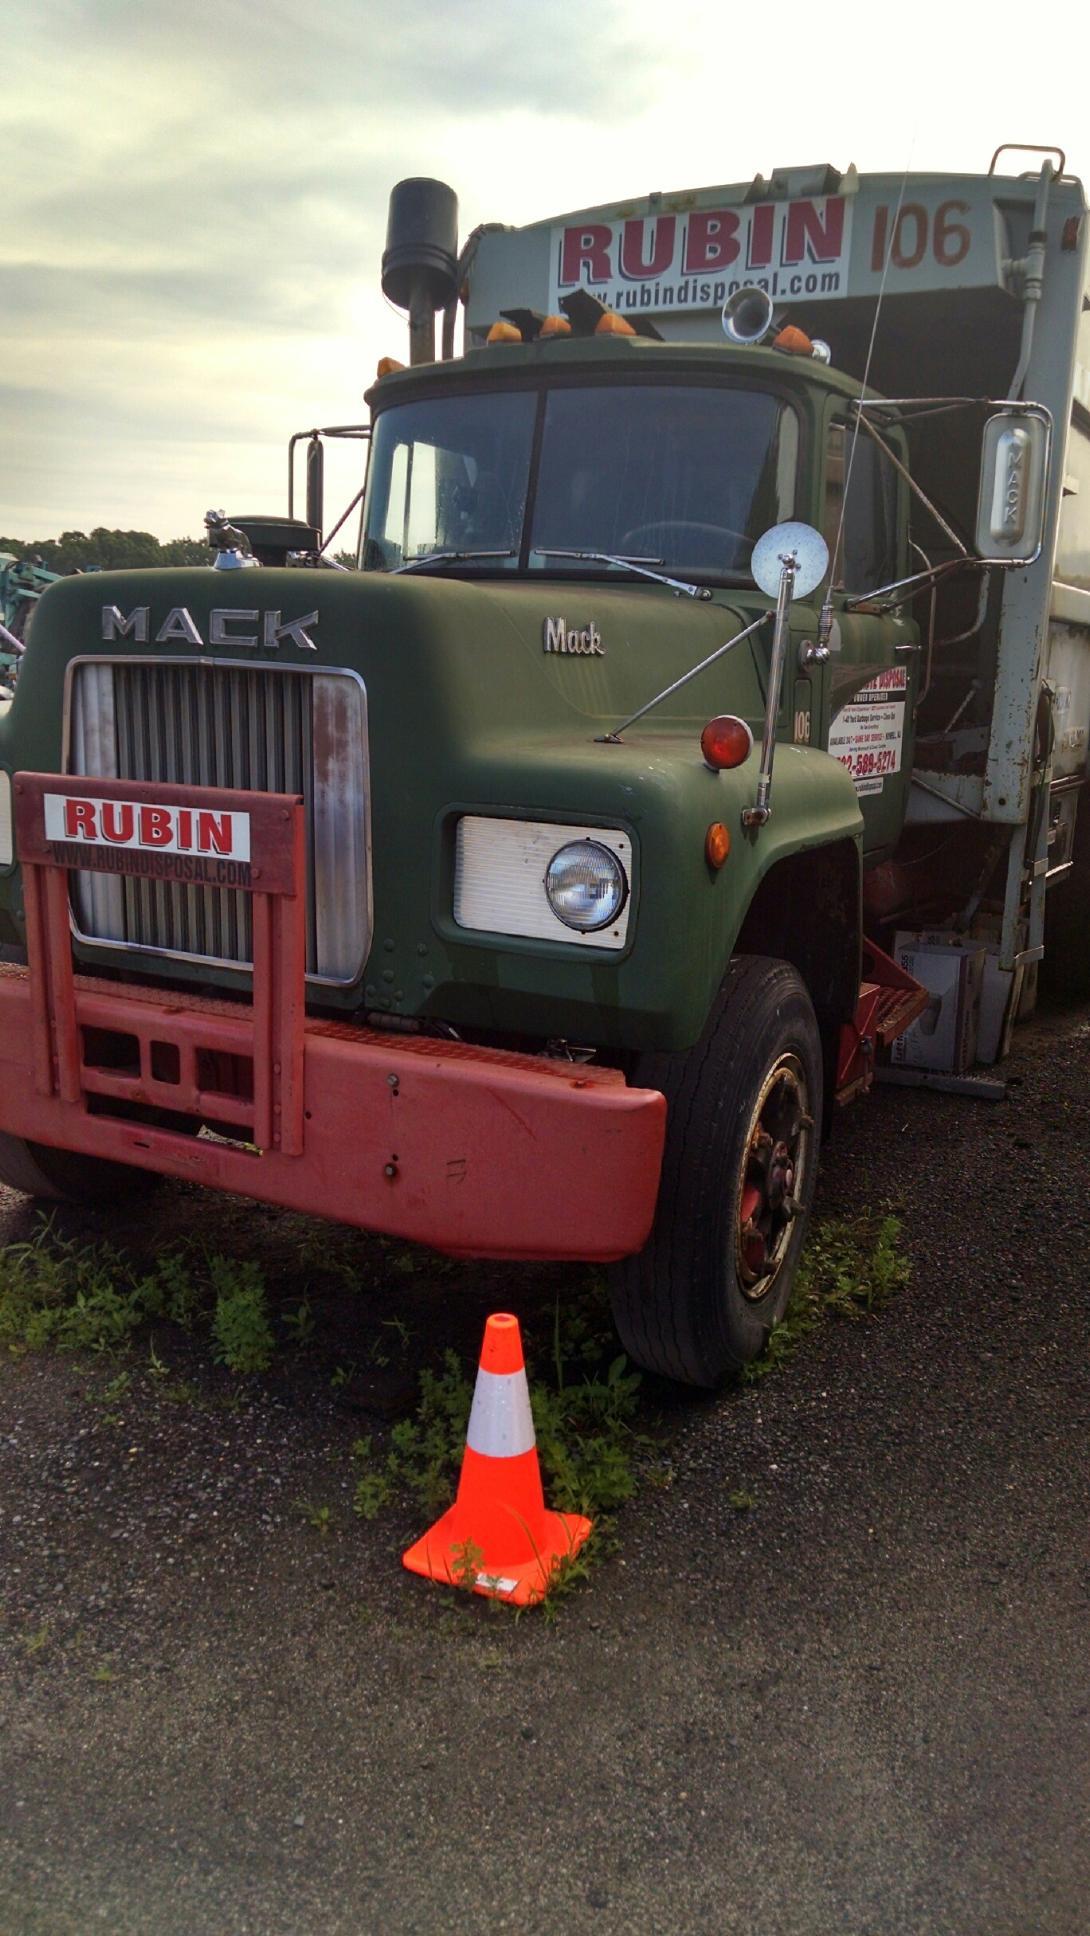 Trucks For Sale: 1976 Mack R Model Garbage Truck For Sale